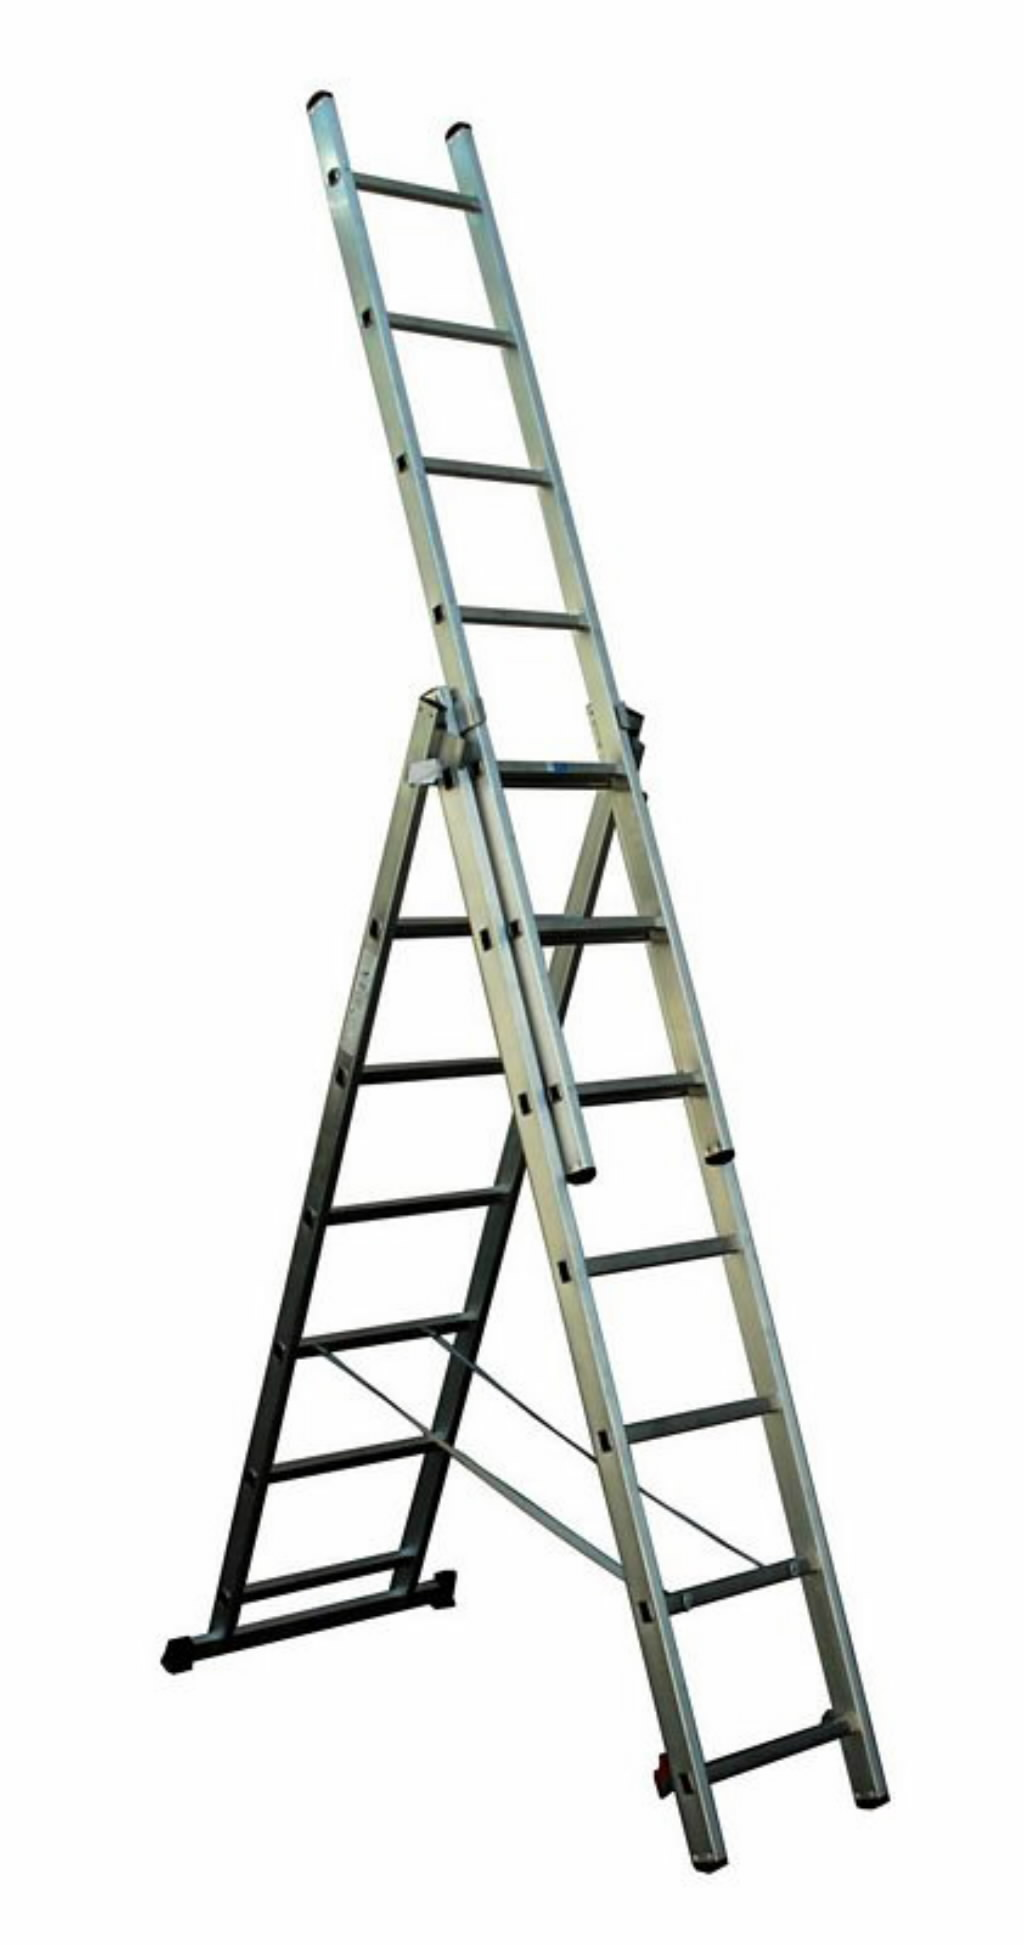 Universal Jacks On Ladders : Universal ladder alpe leaning ladders